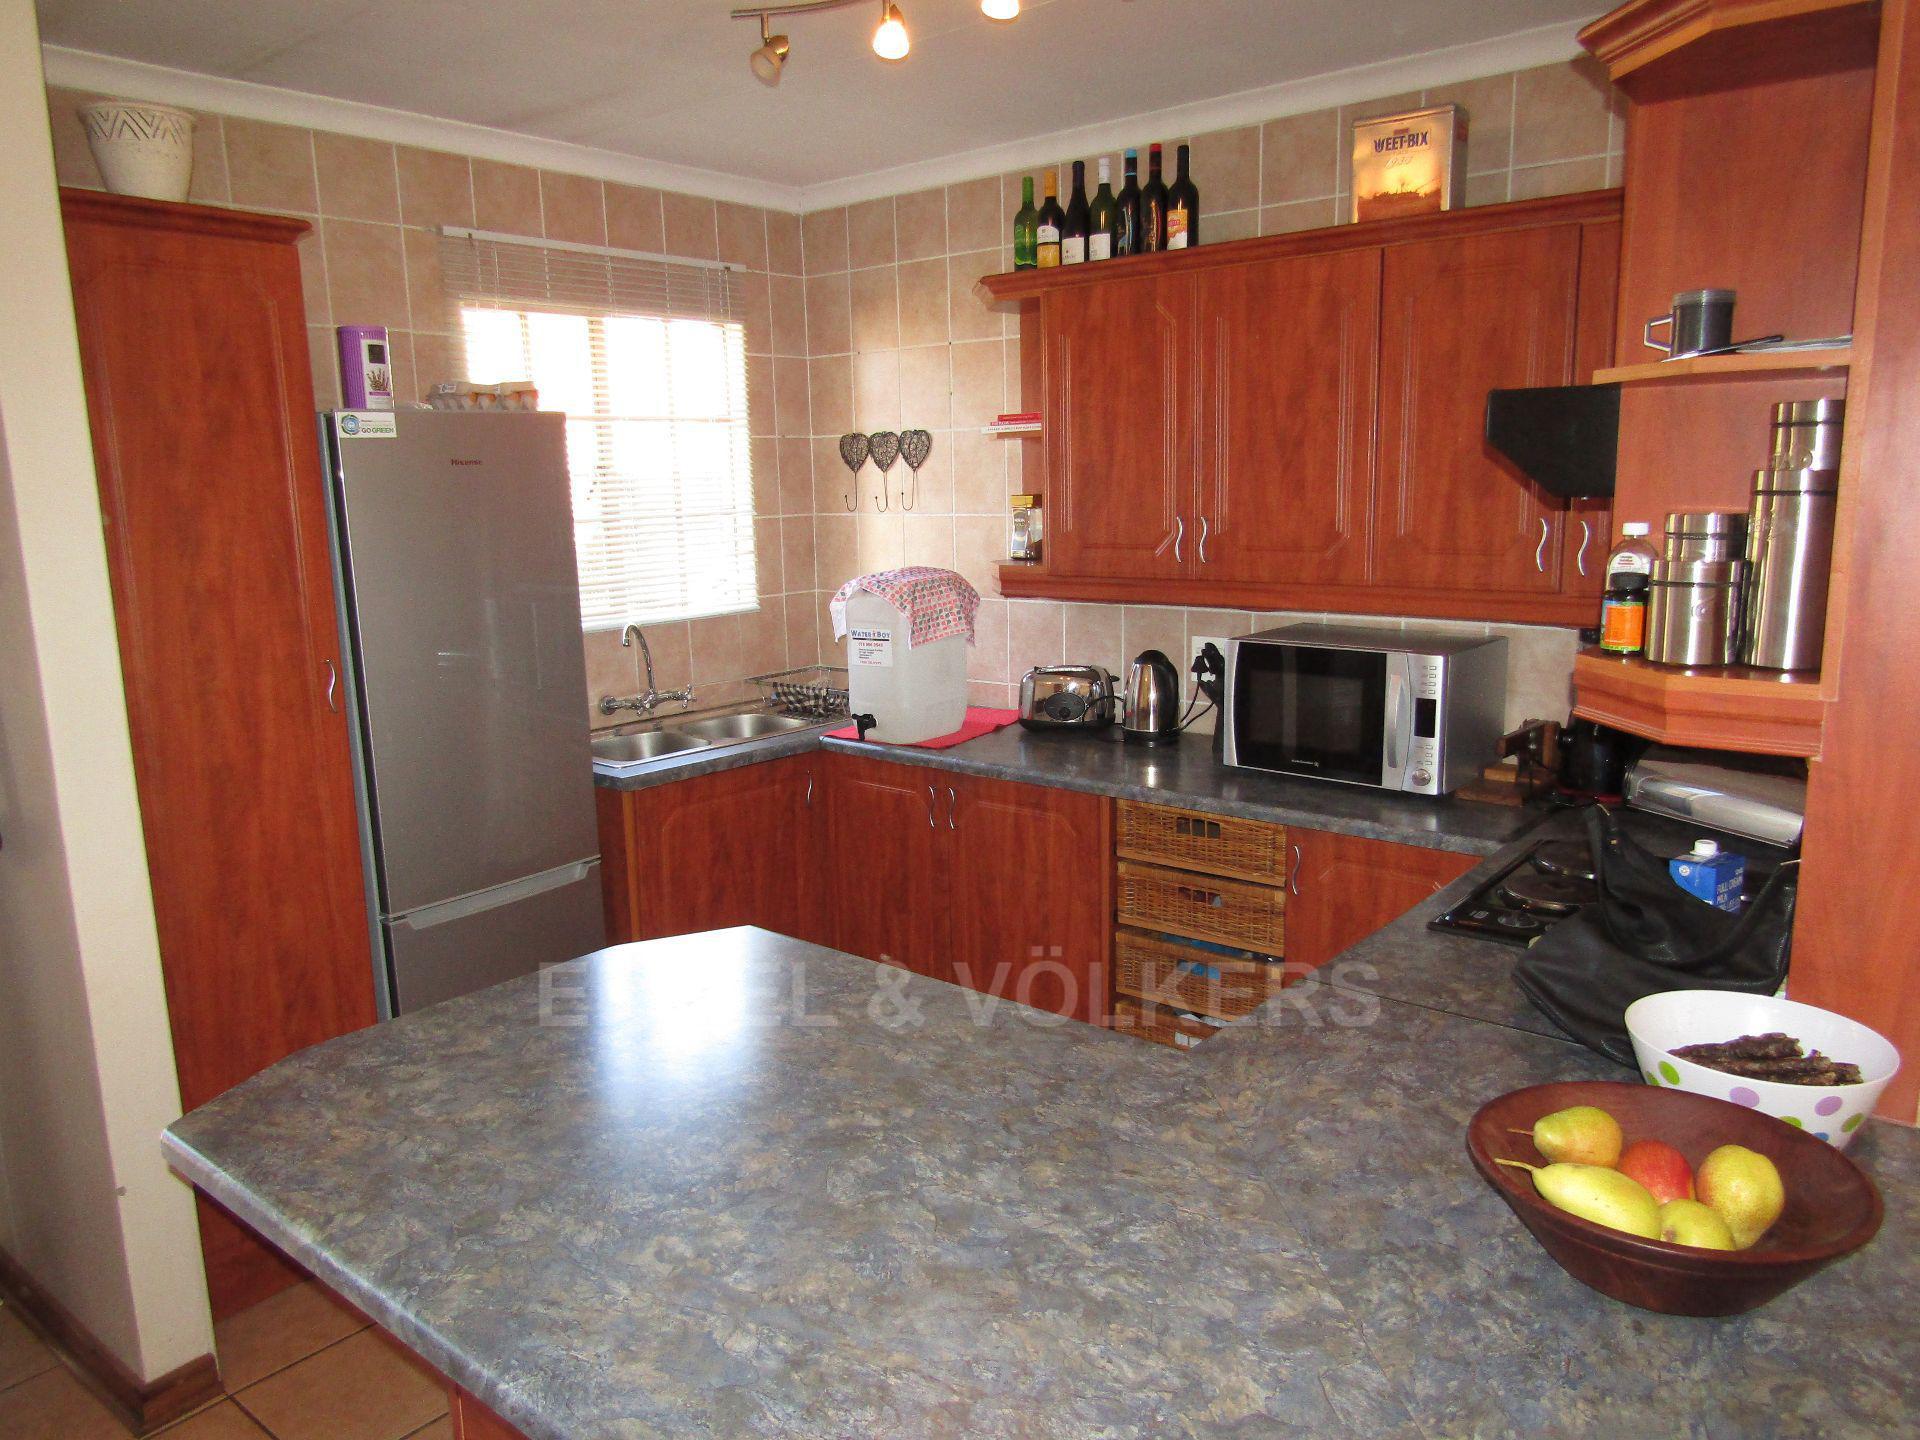 Baillie Park property for sale. Ref No: 13520599. Picture no 6